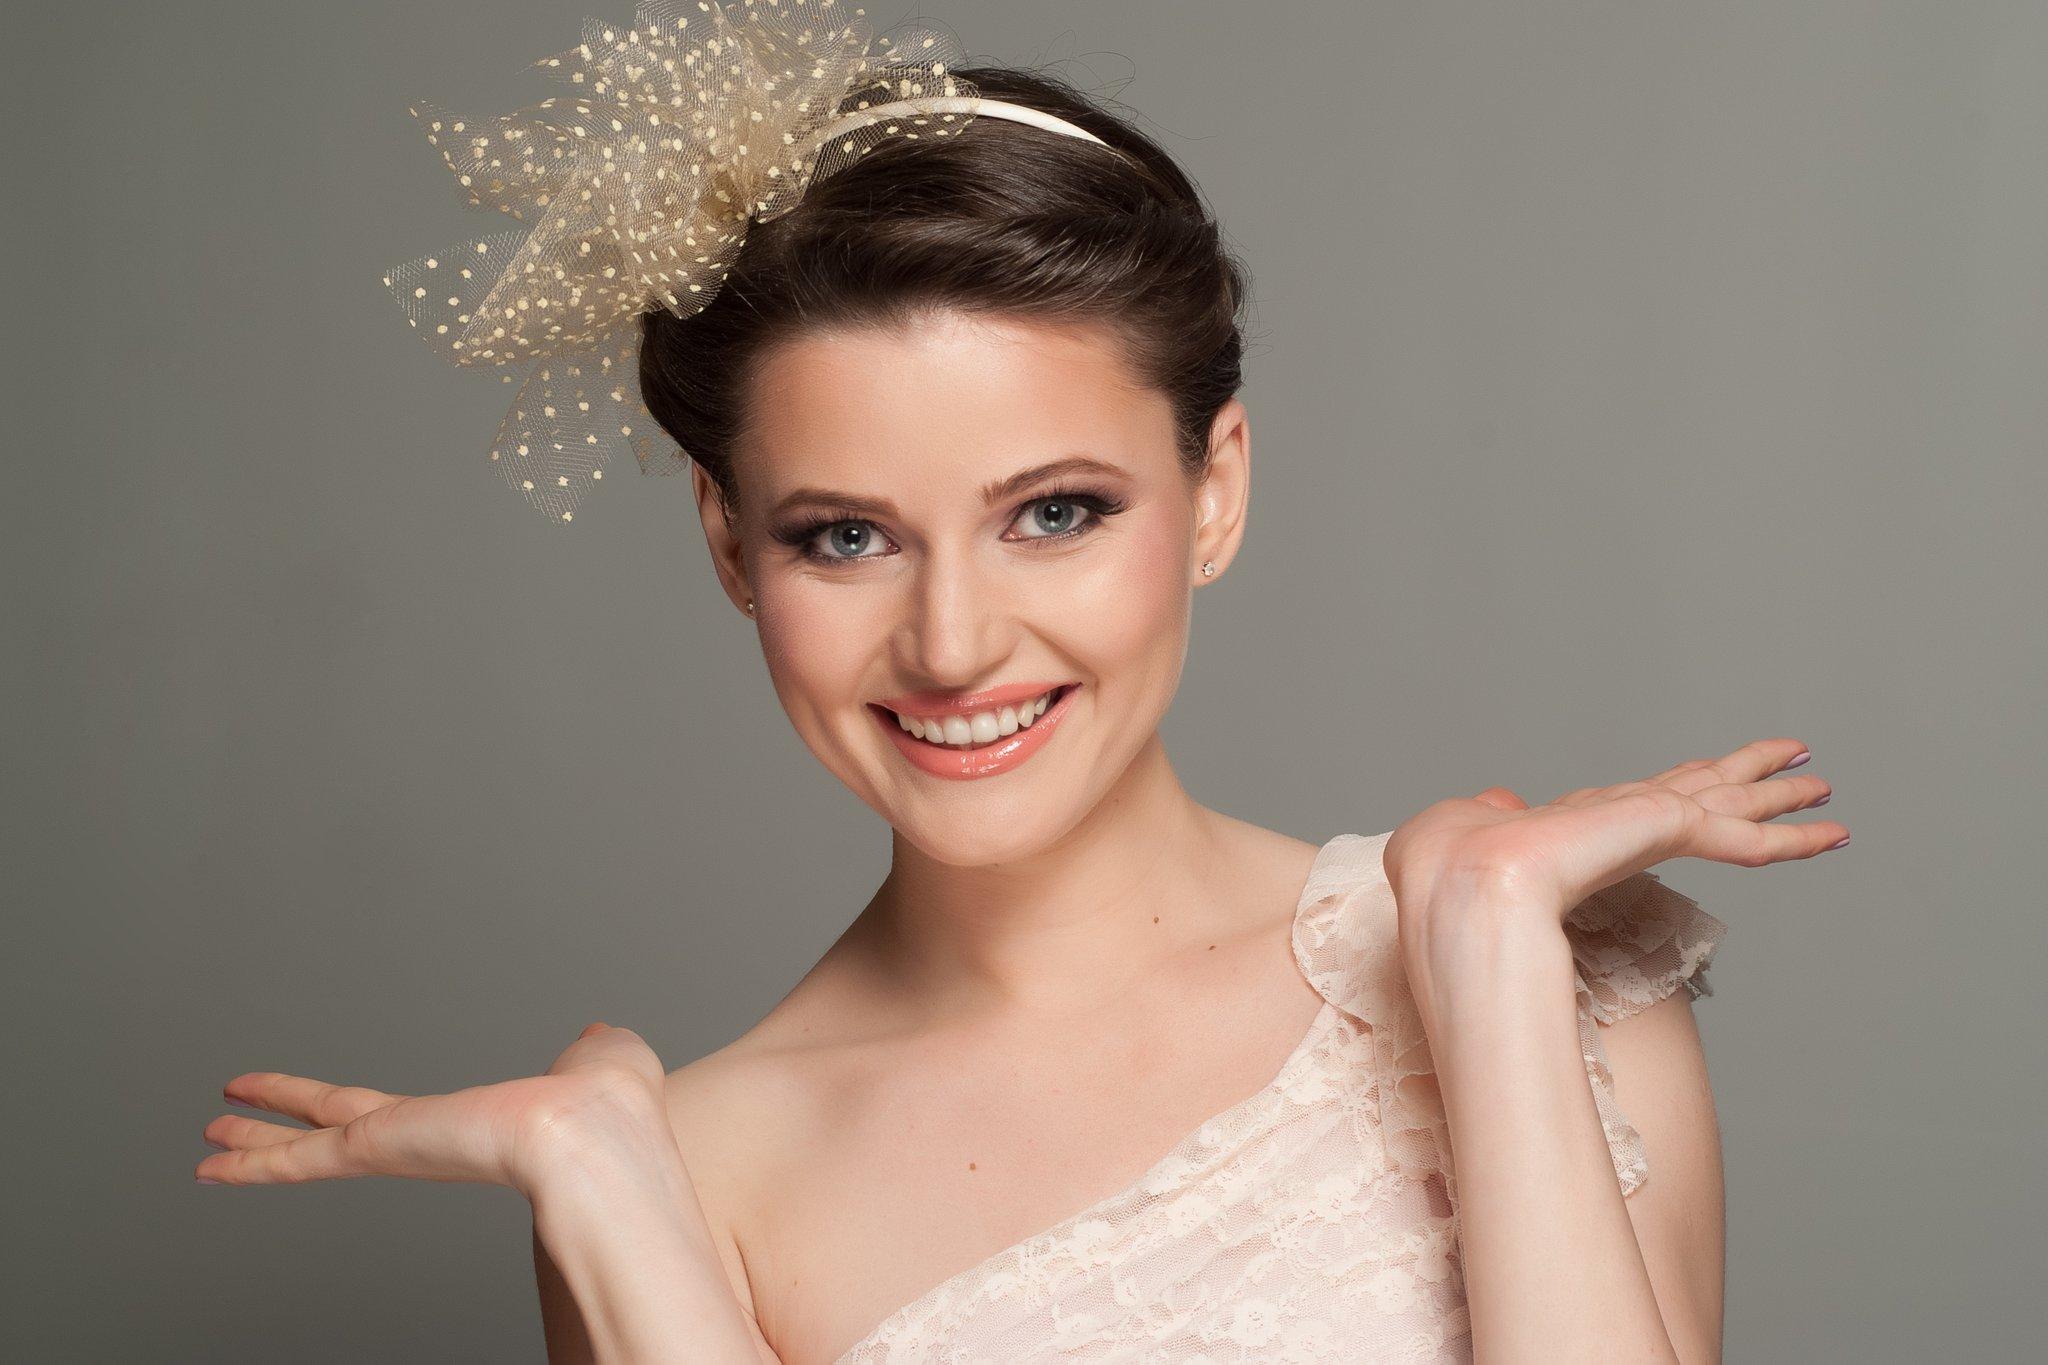 Make-up artist Ioana Cristea